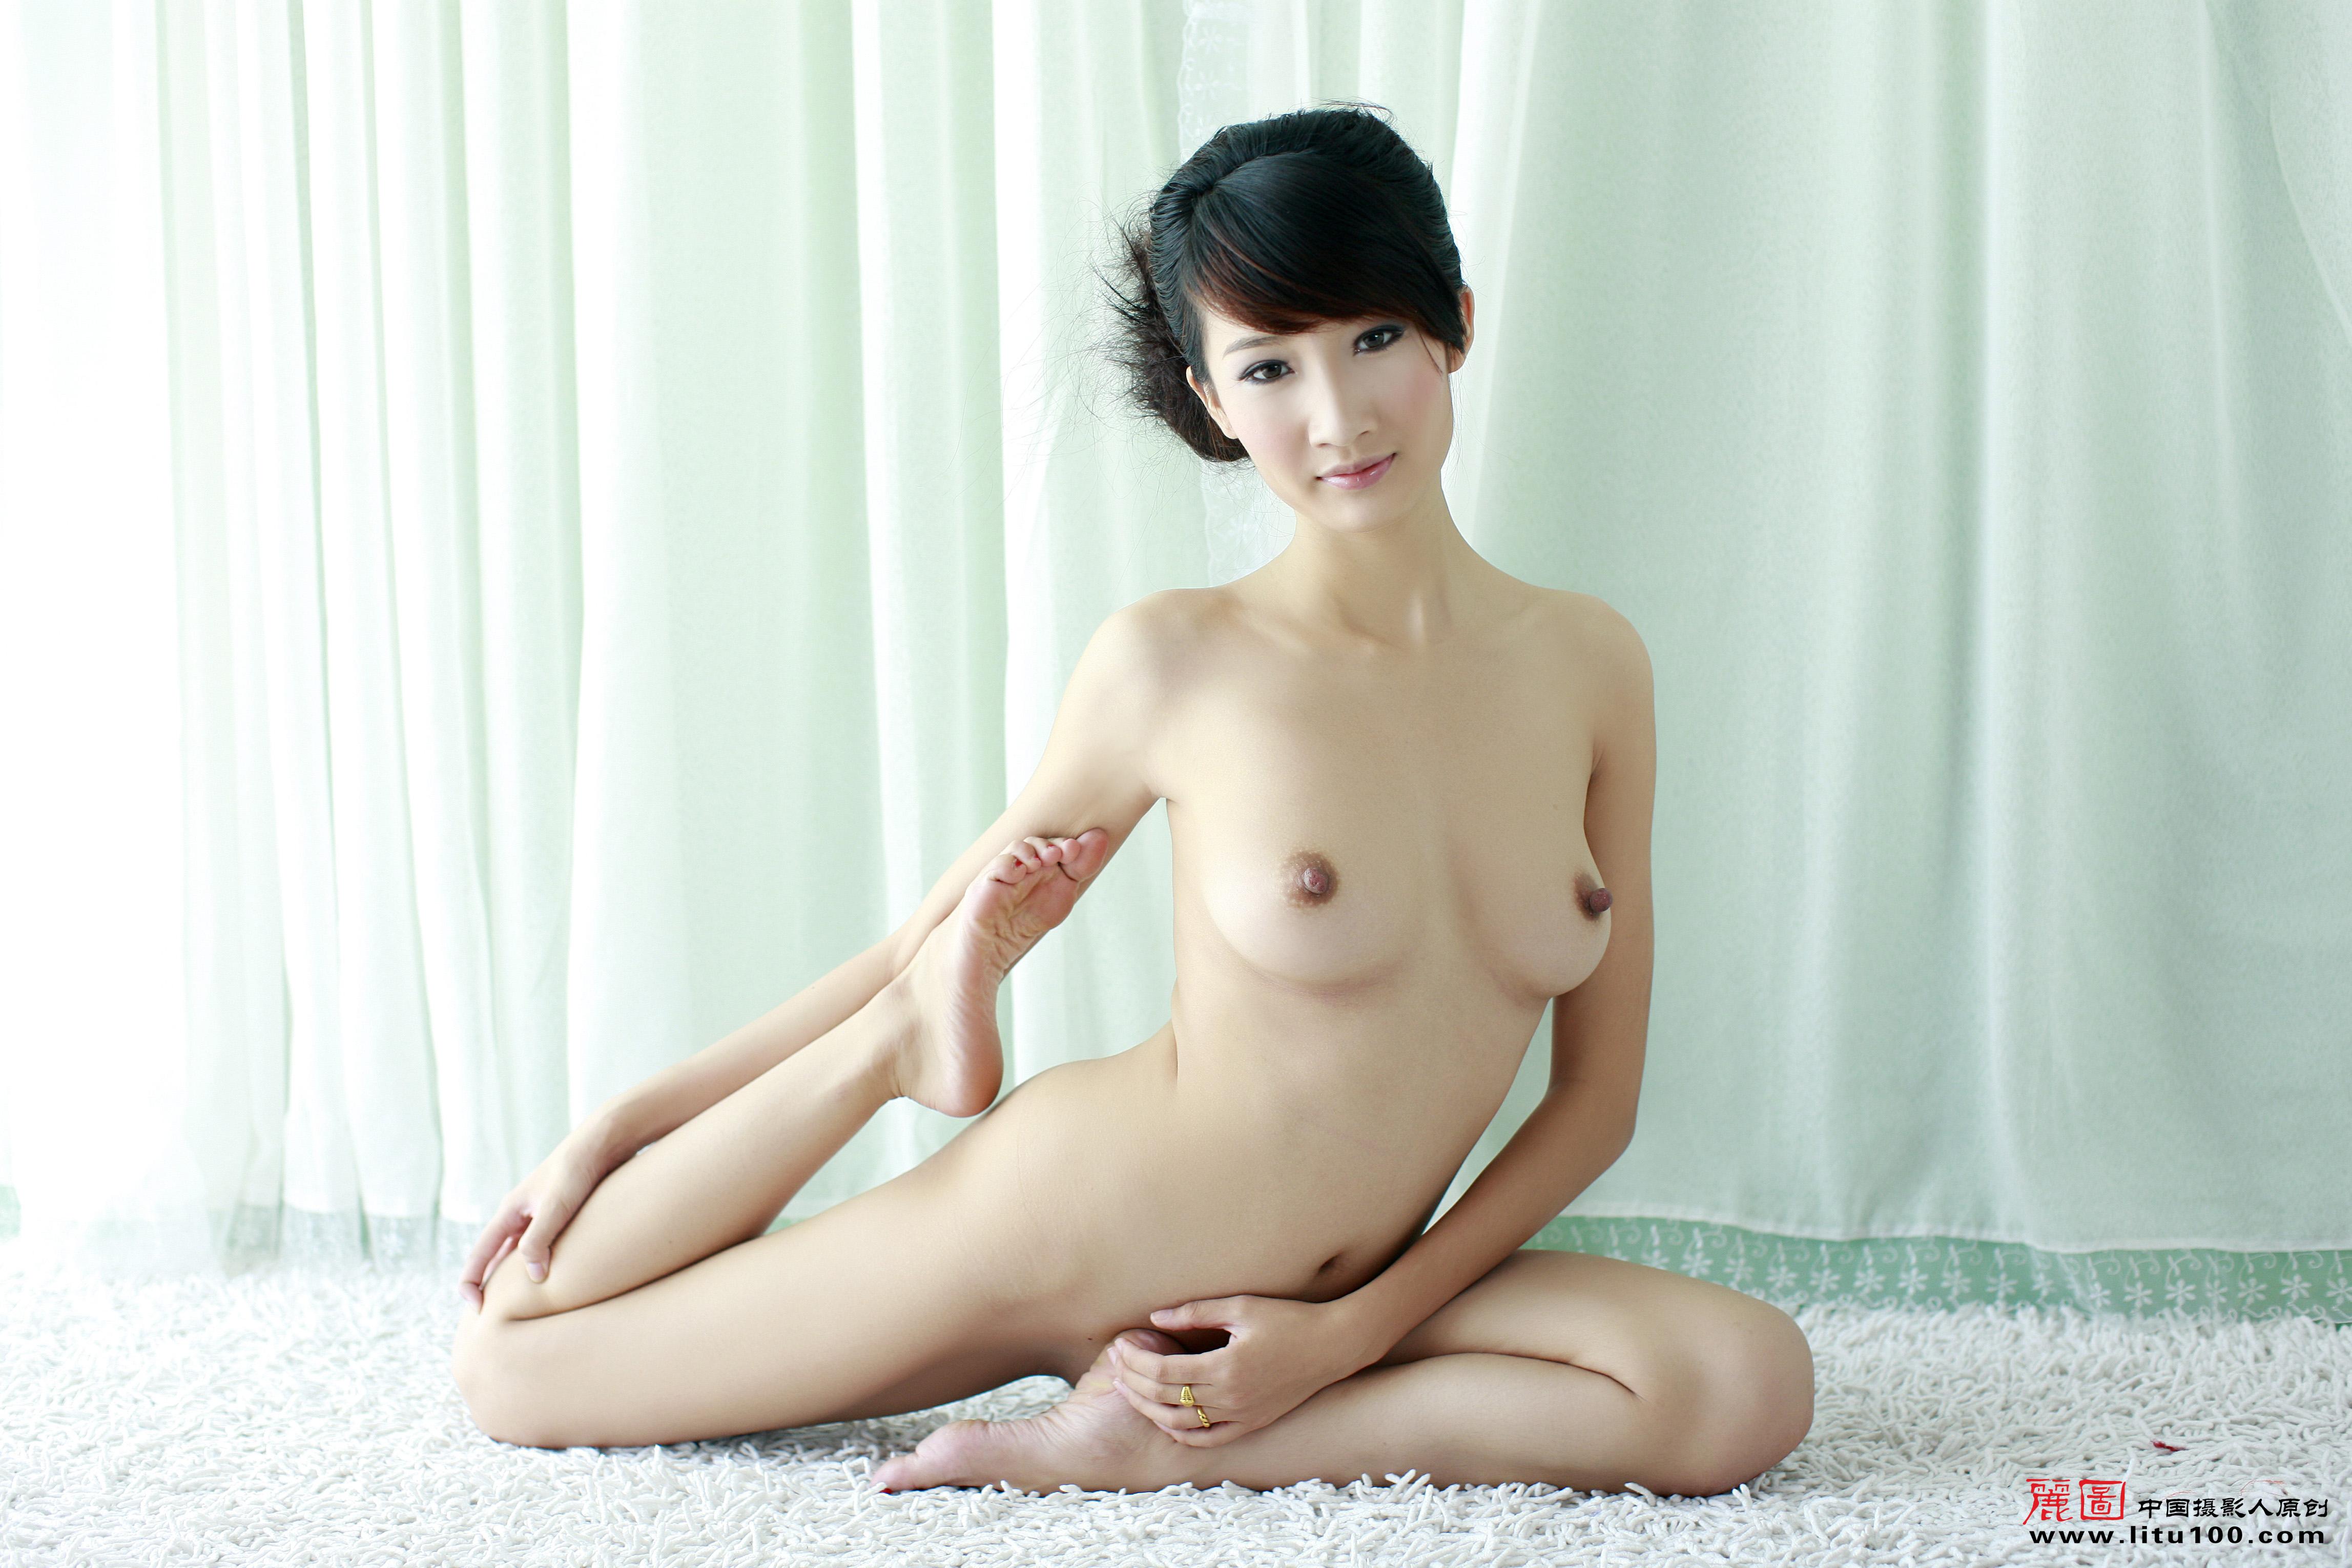 Японки ню фото 17 фотография